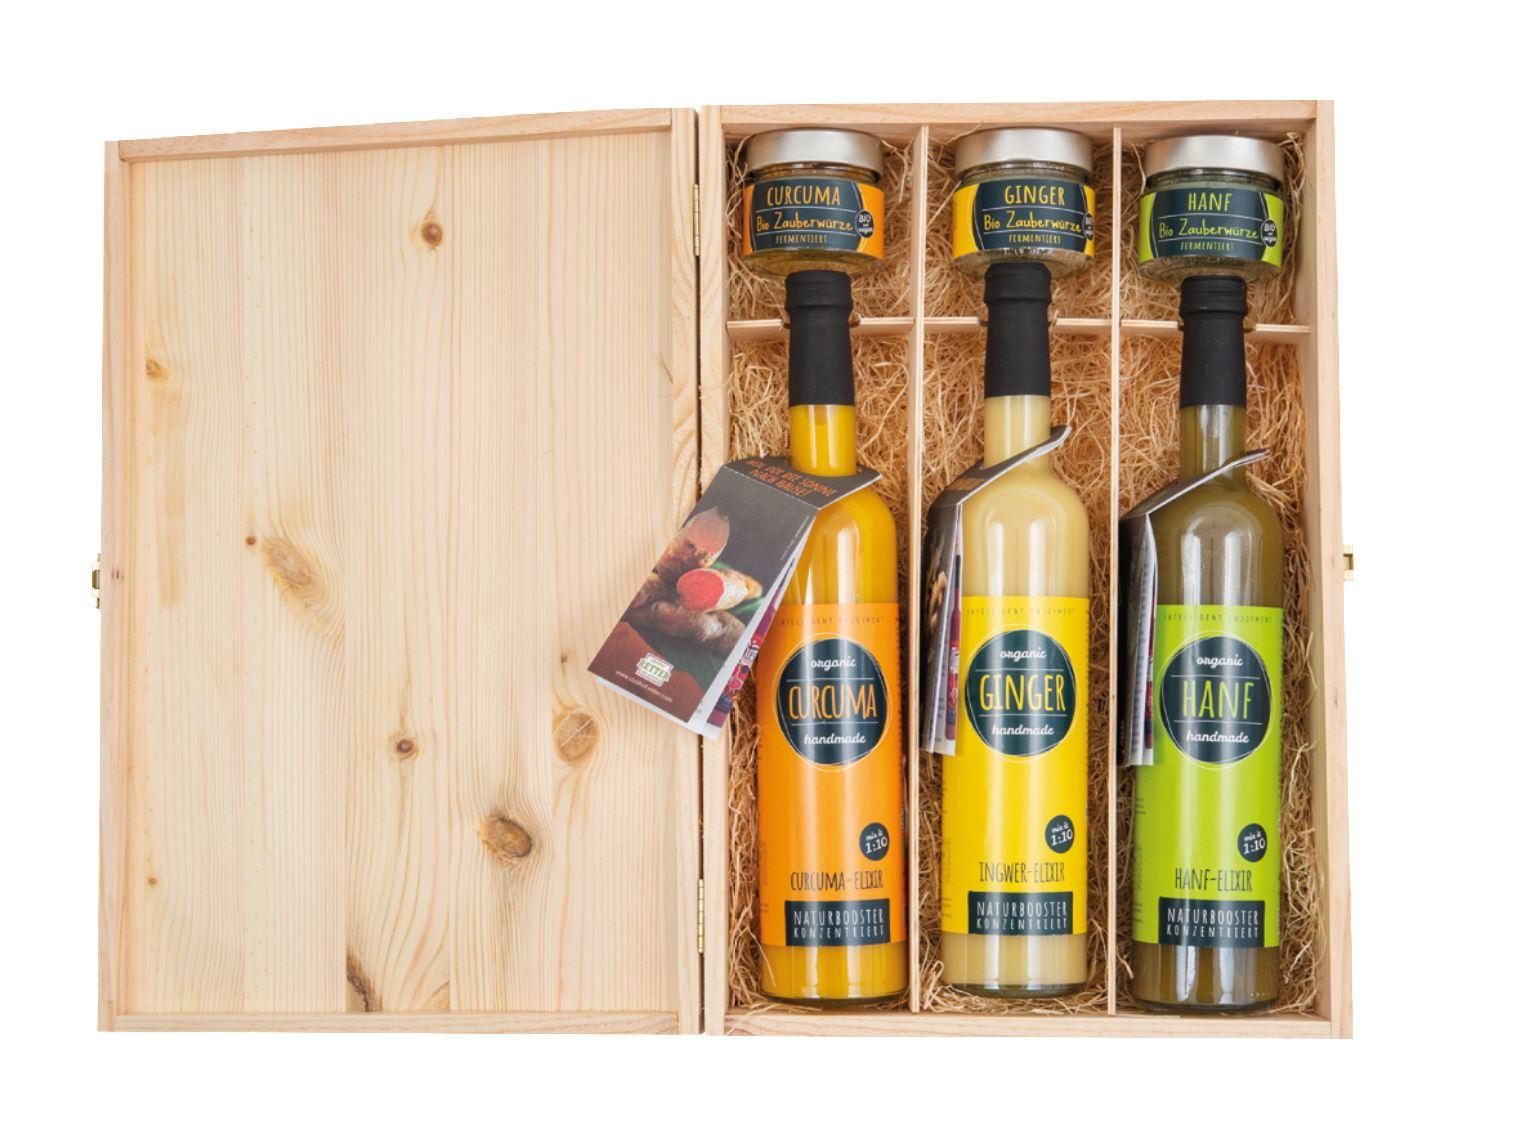 Geschenkideen Ginger, Hanf & Curcuma Elixire & Zauberwürze